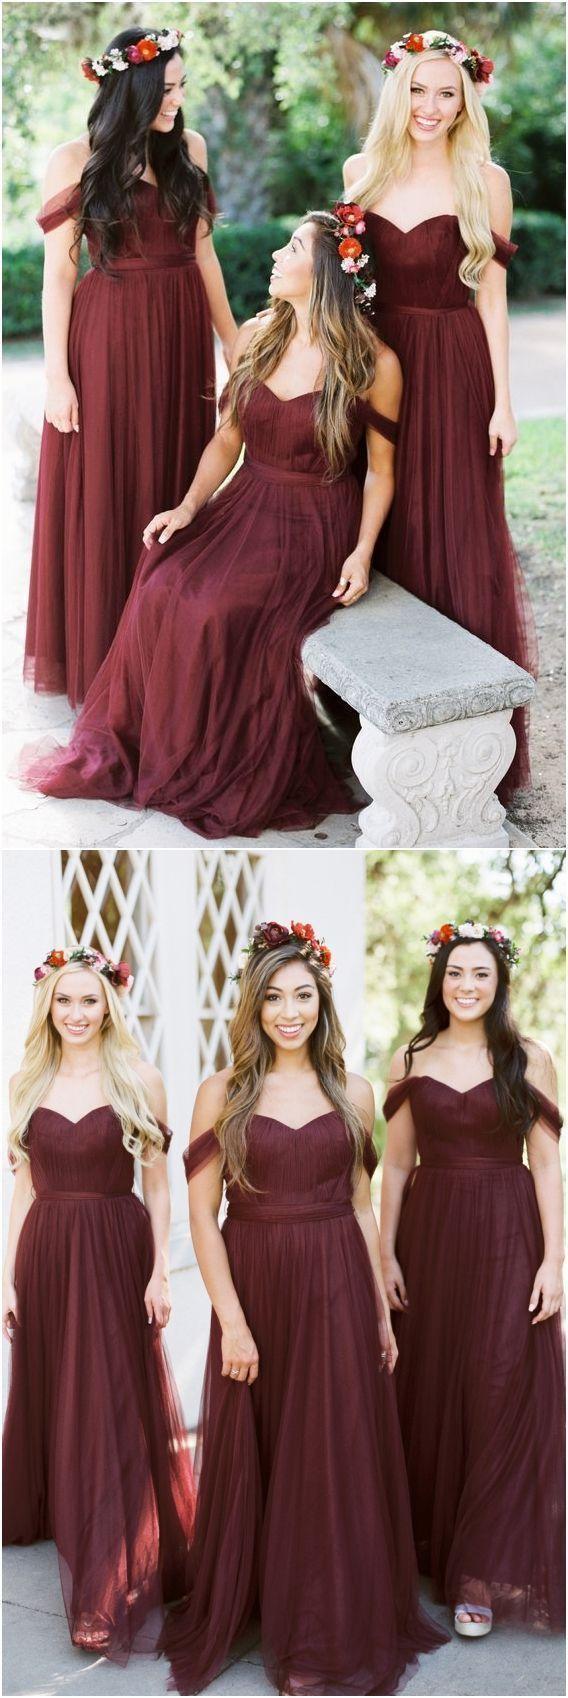 Wedding - Bridesmaids Ideas